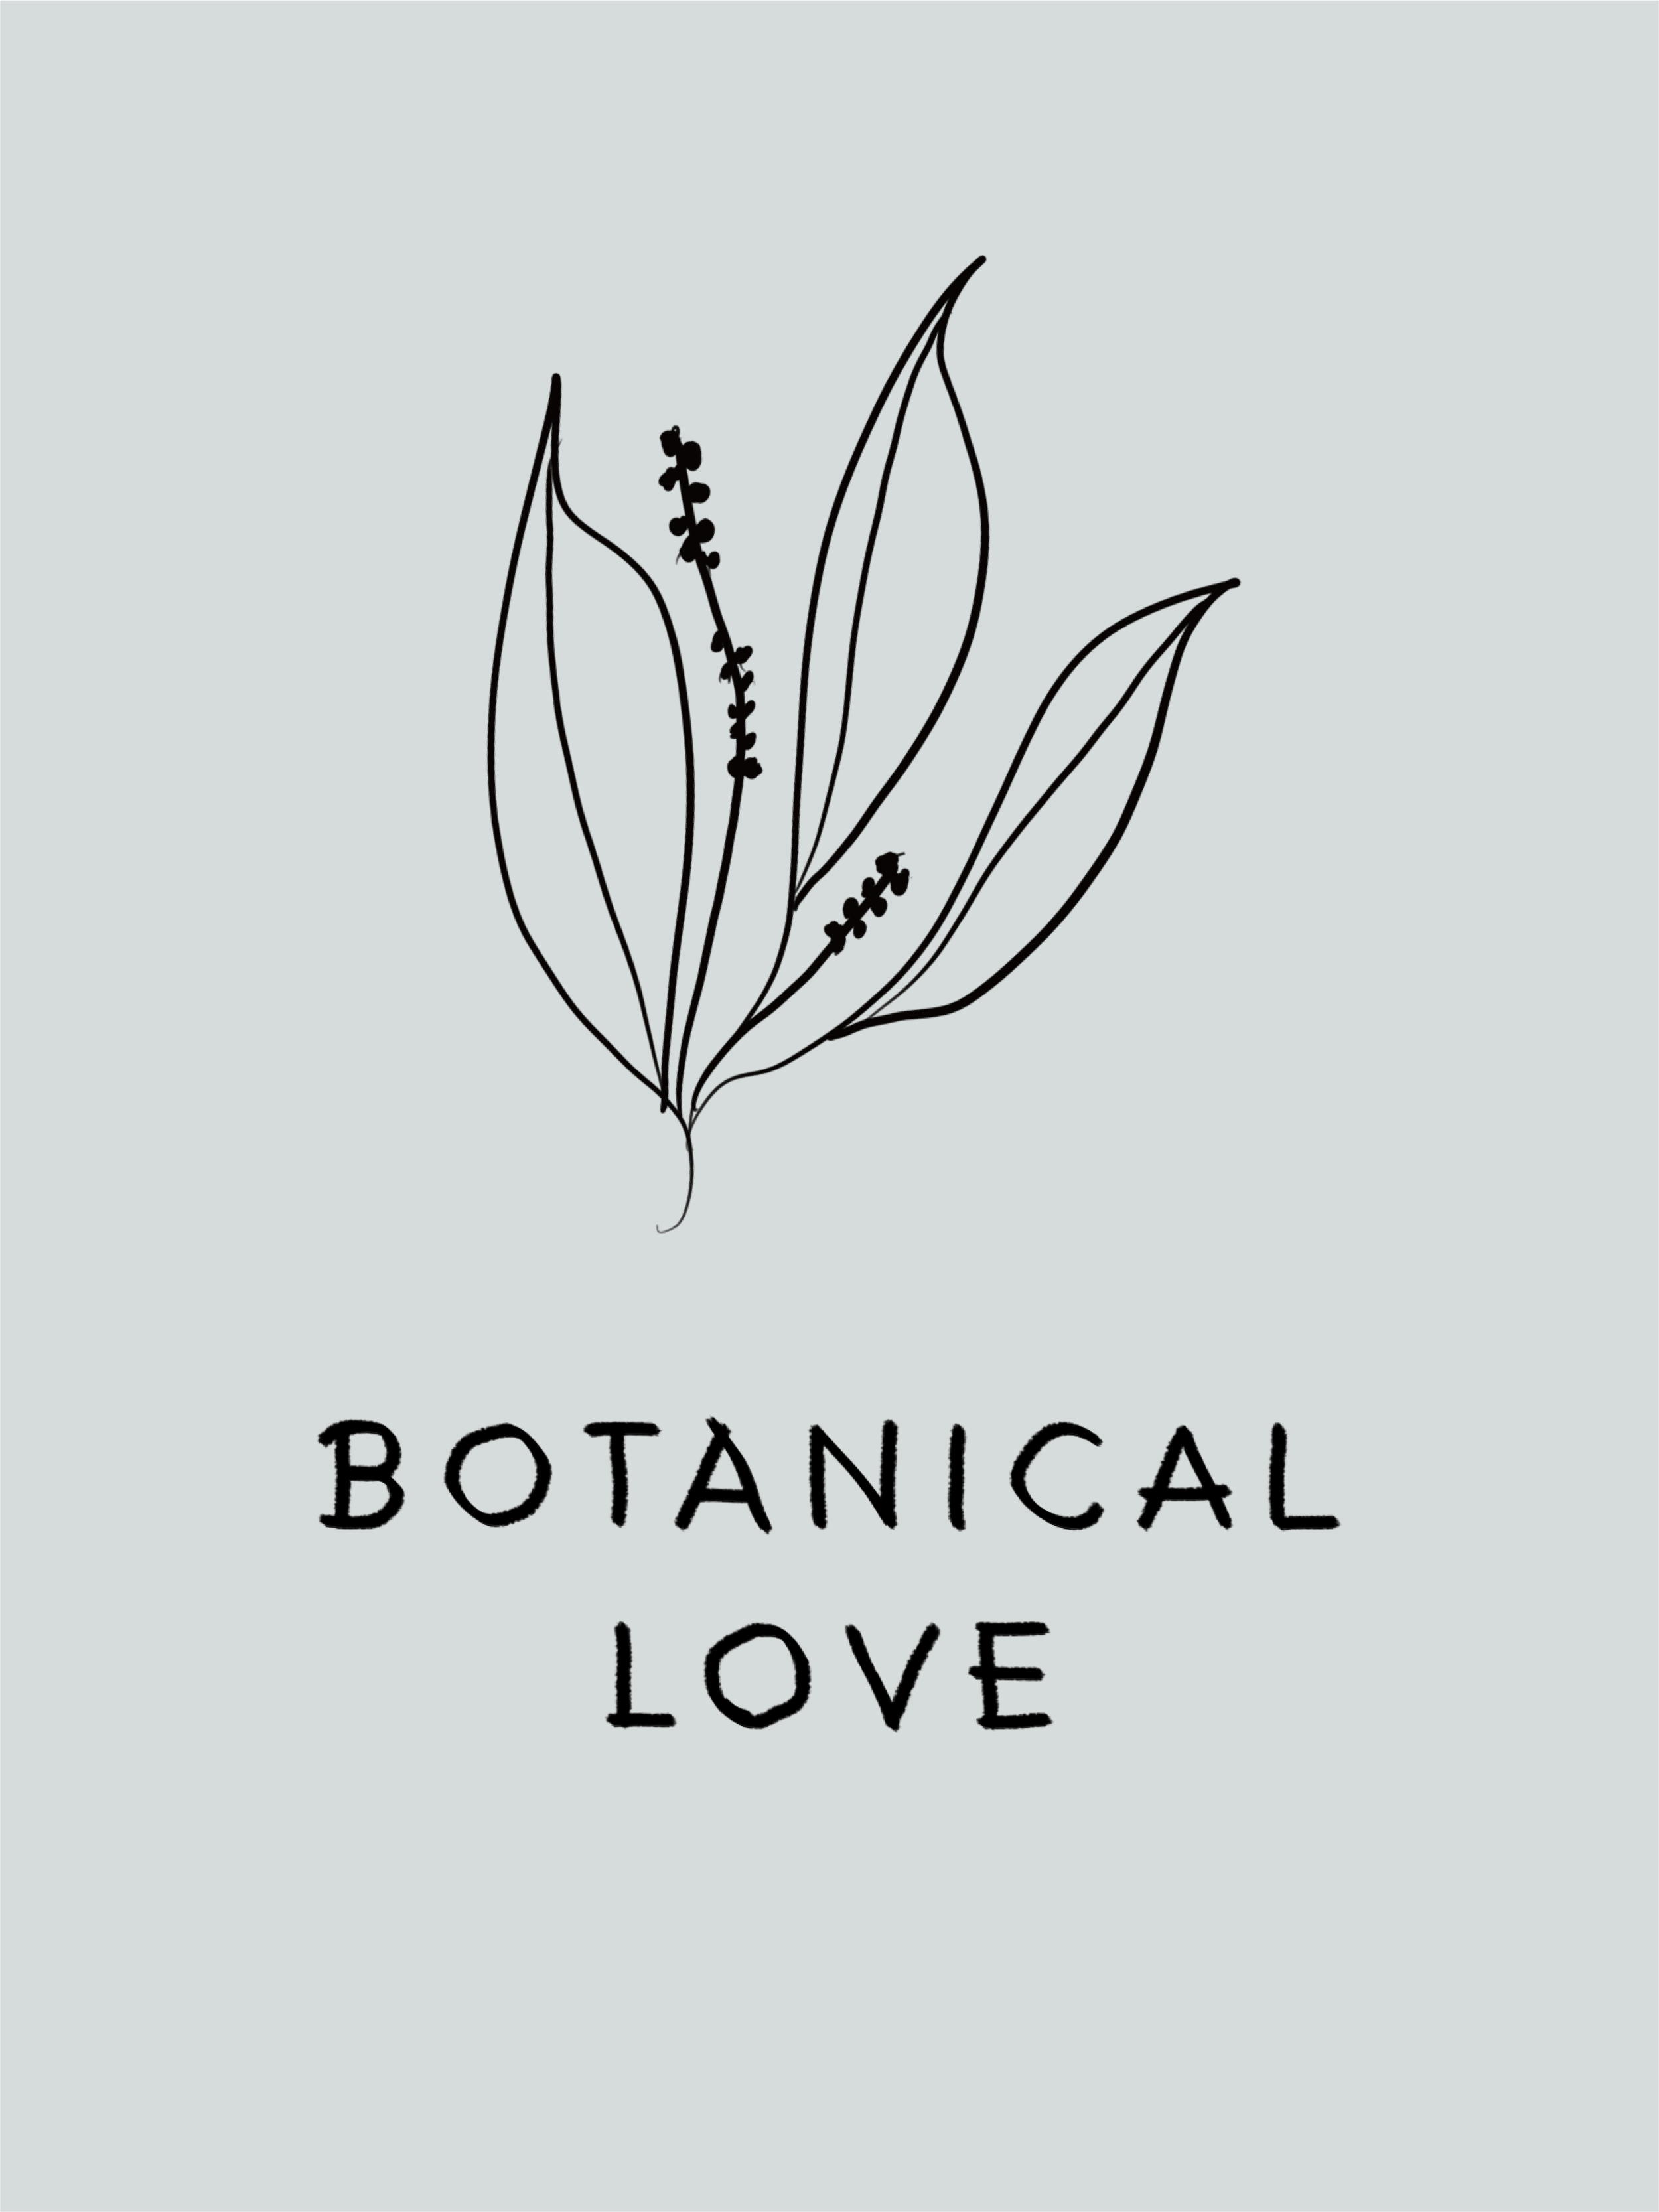 Botanical Love Illustration and Lettering // Phylleli Design Studio and Blog